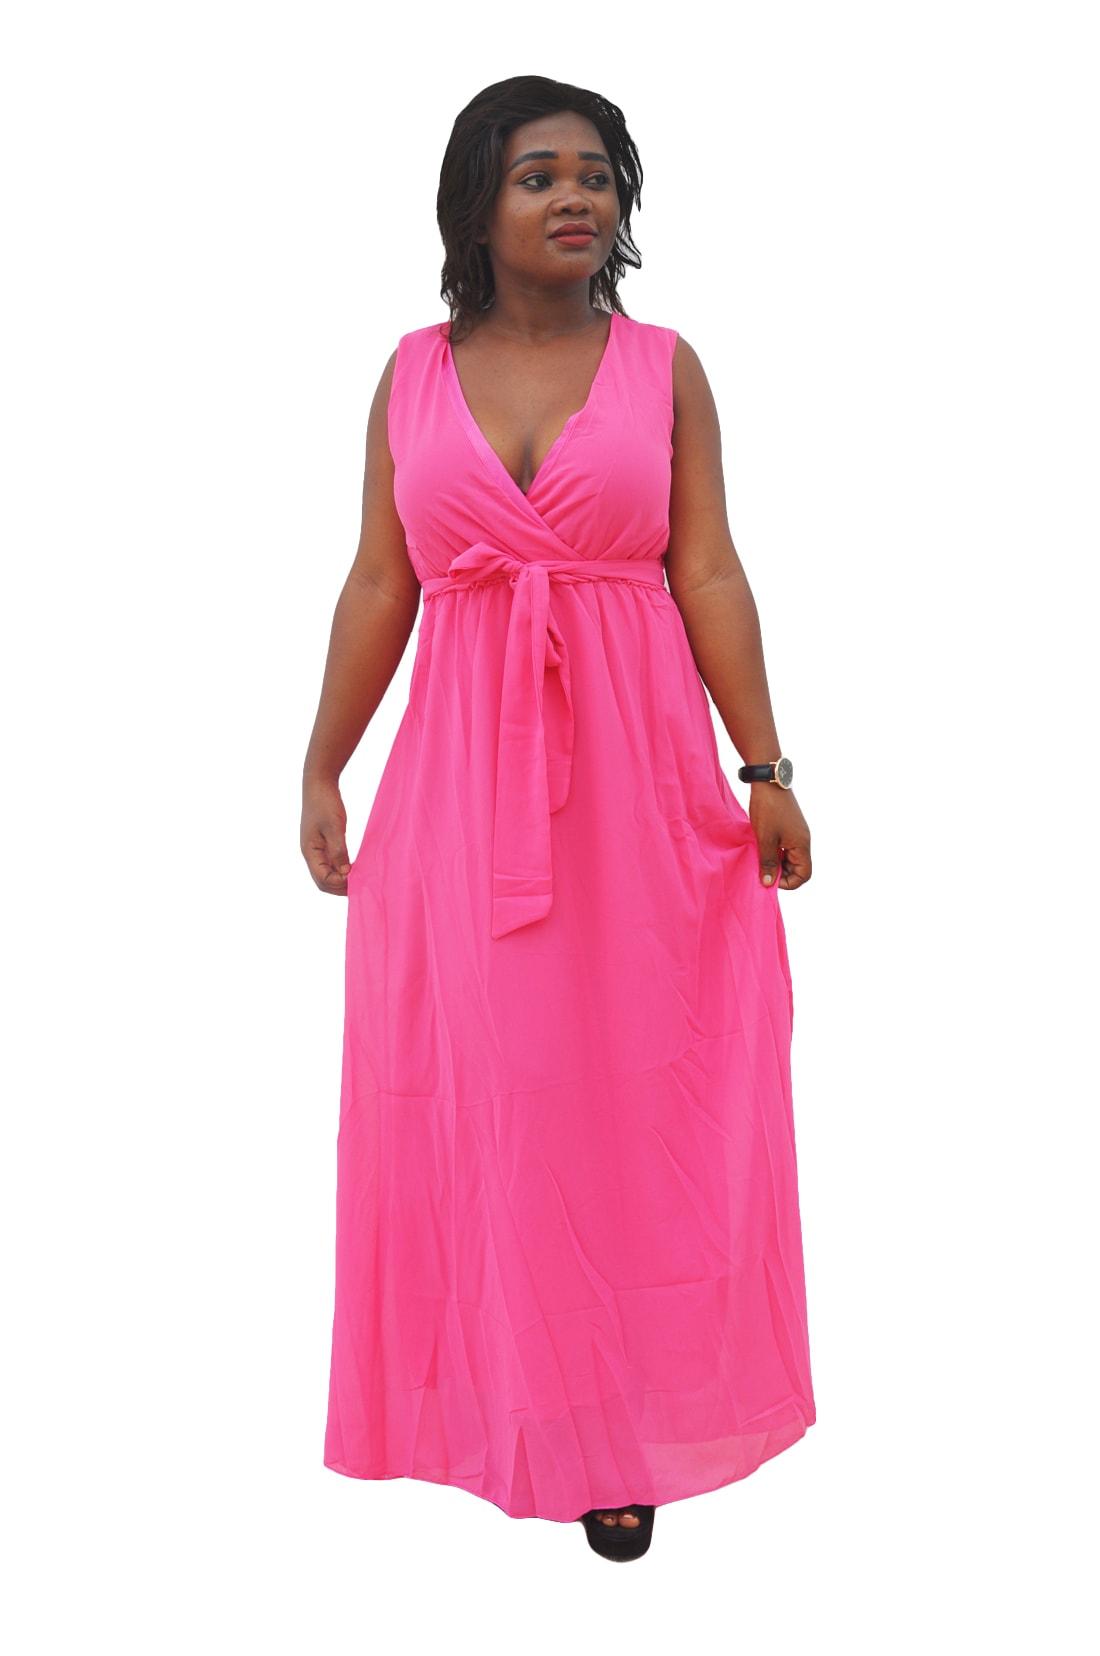 M0297 pink2 Bohemian Dresses maureens.com boutique